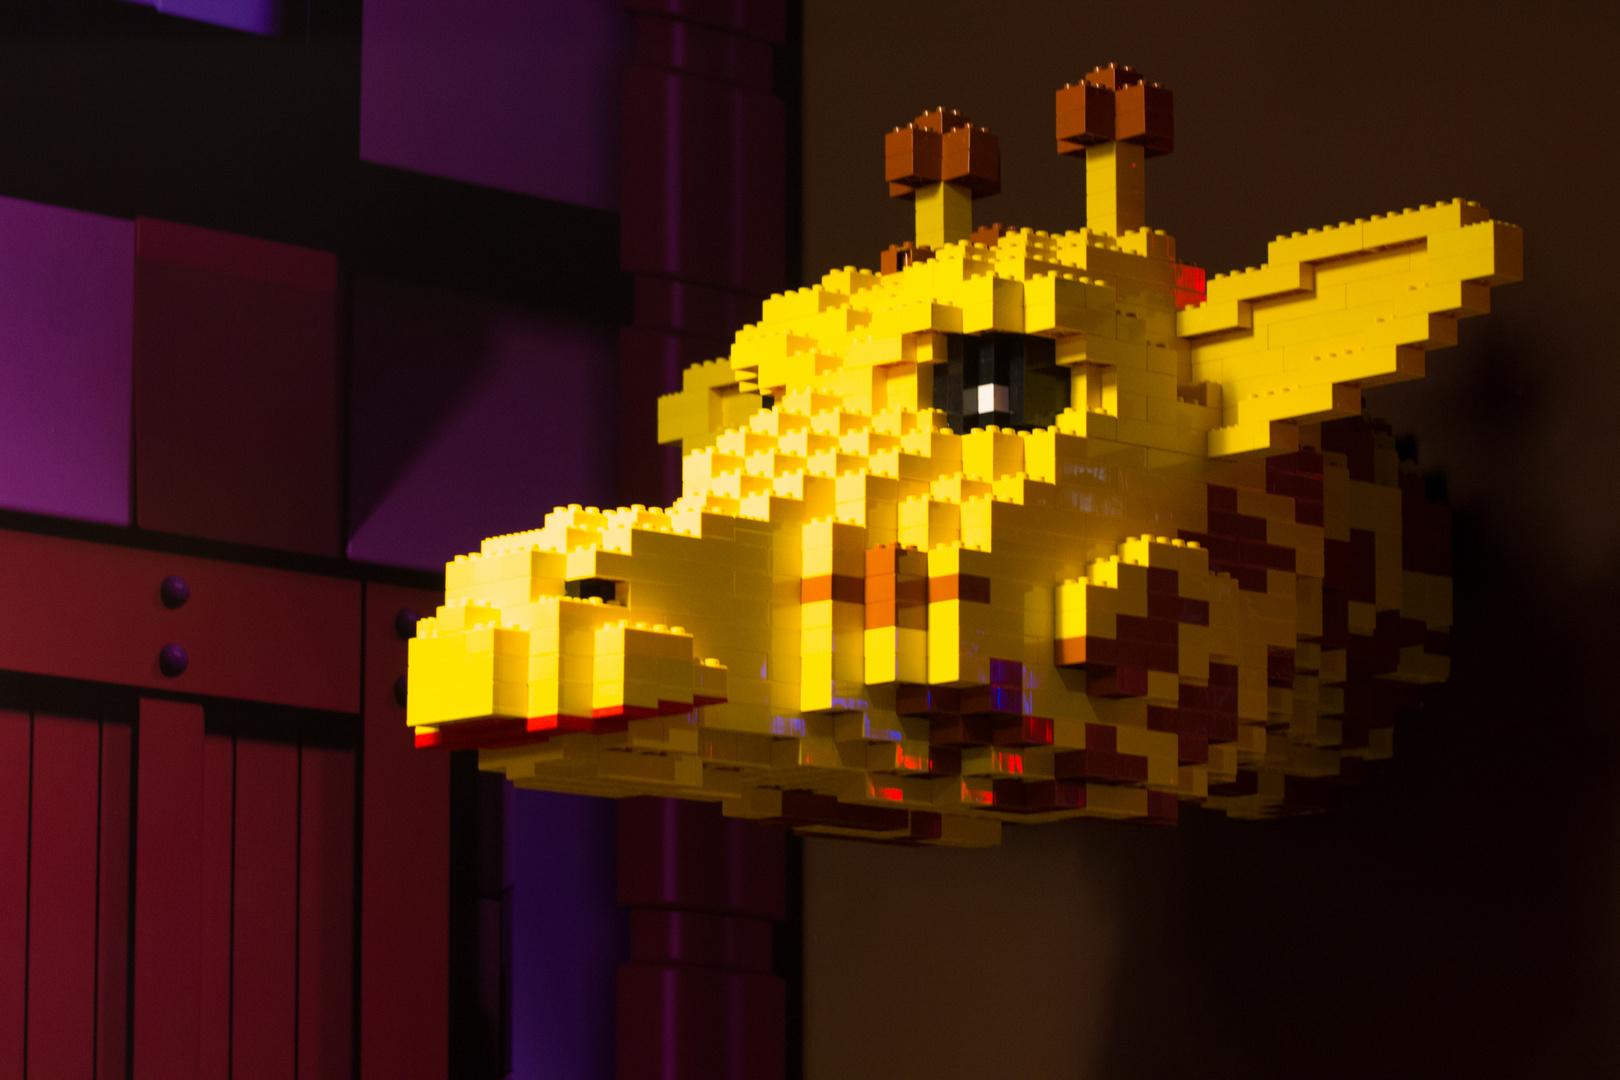 Lego - Giraffe